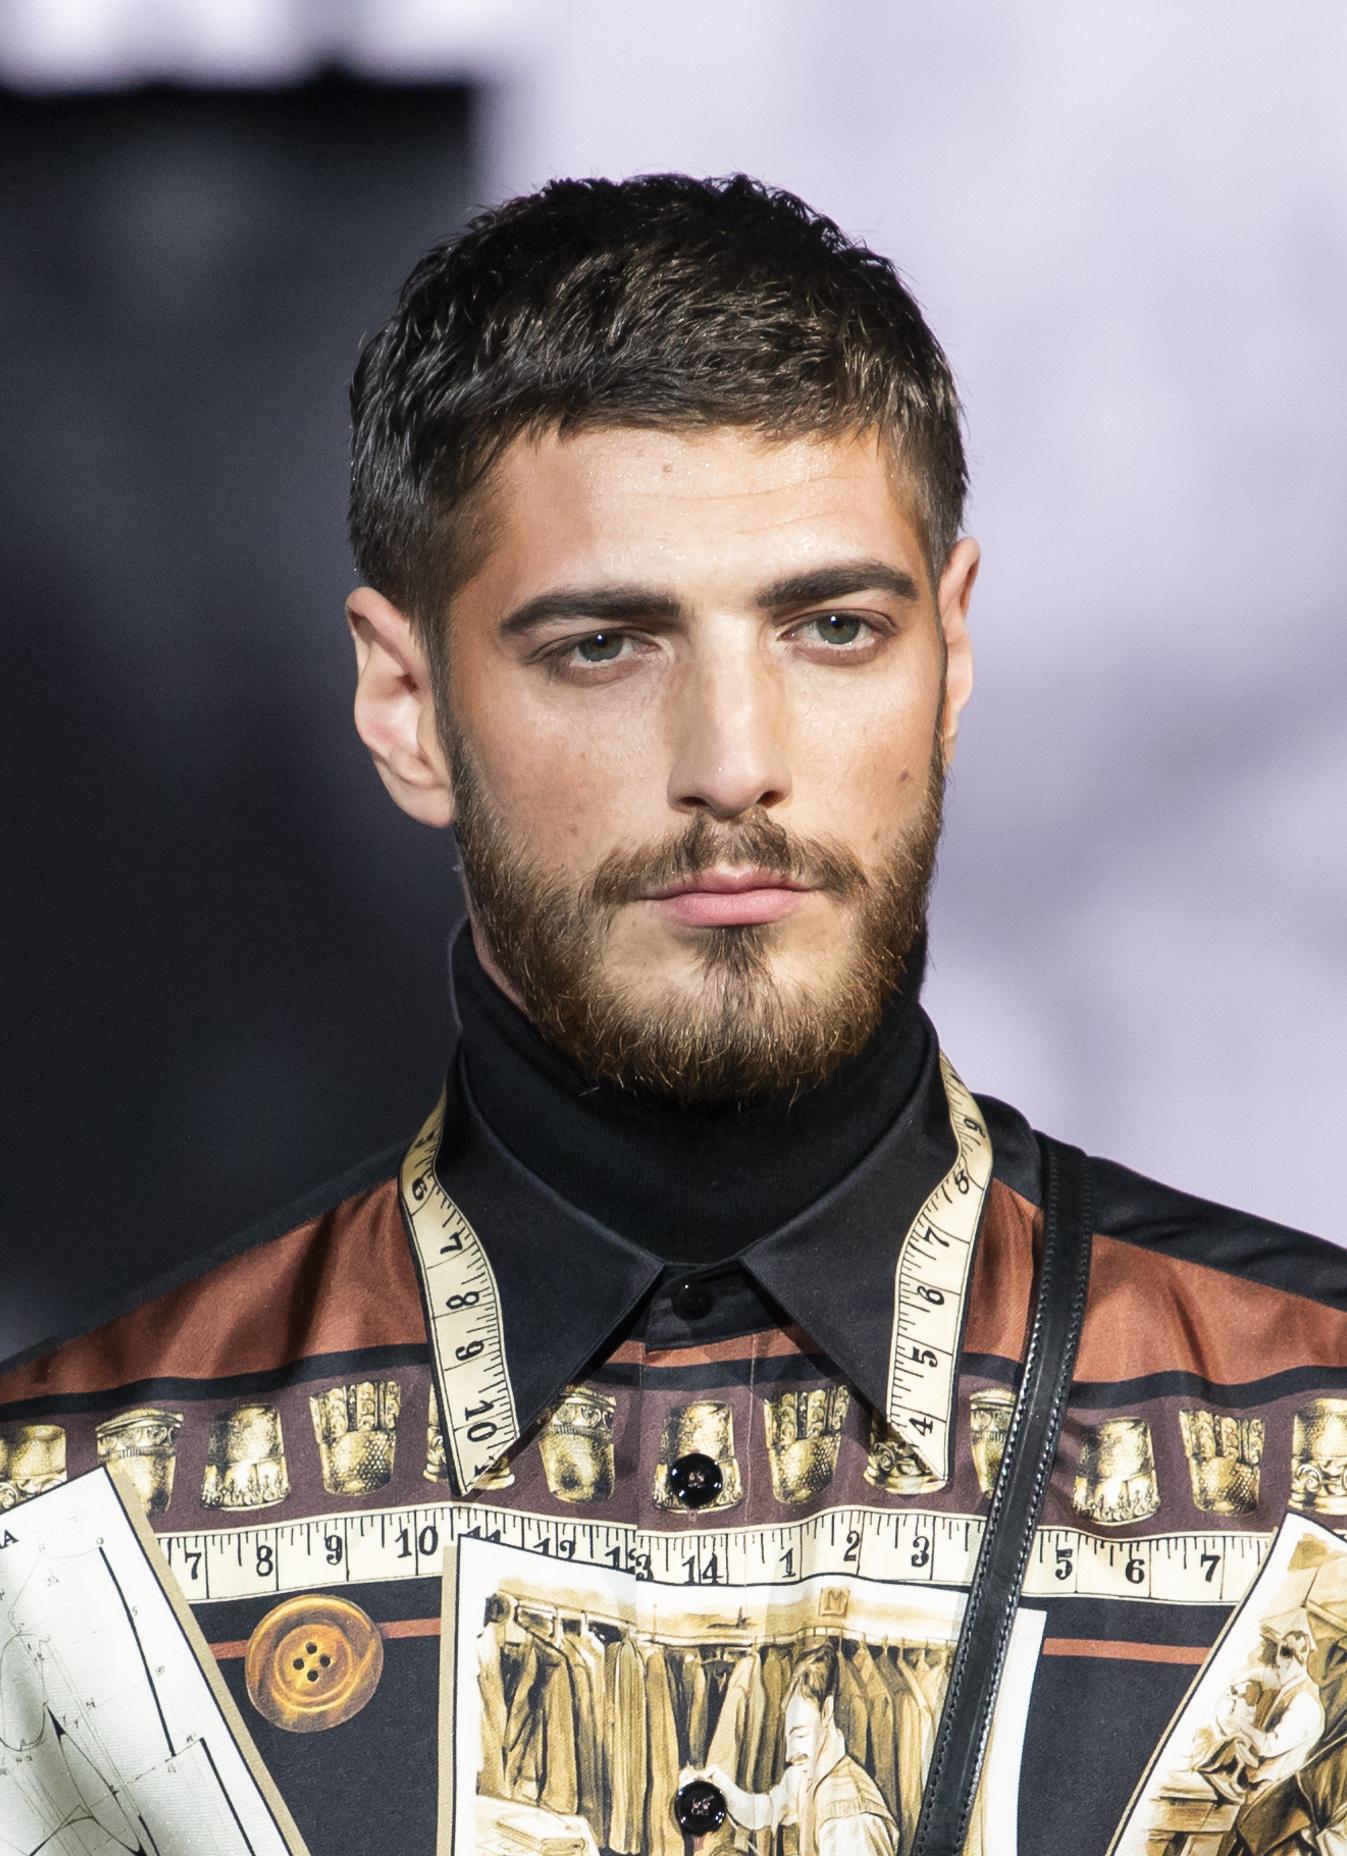 Modelo en el desfile de Dolce & Gabbana